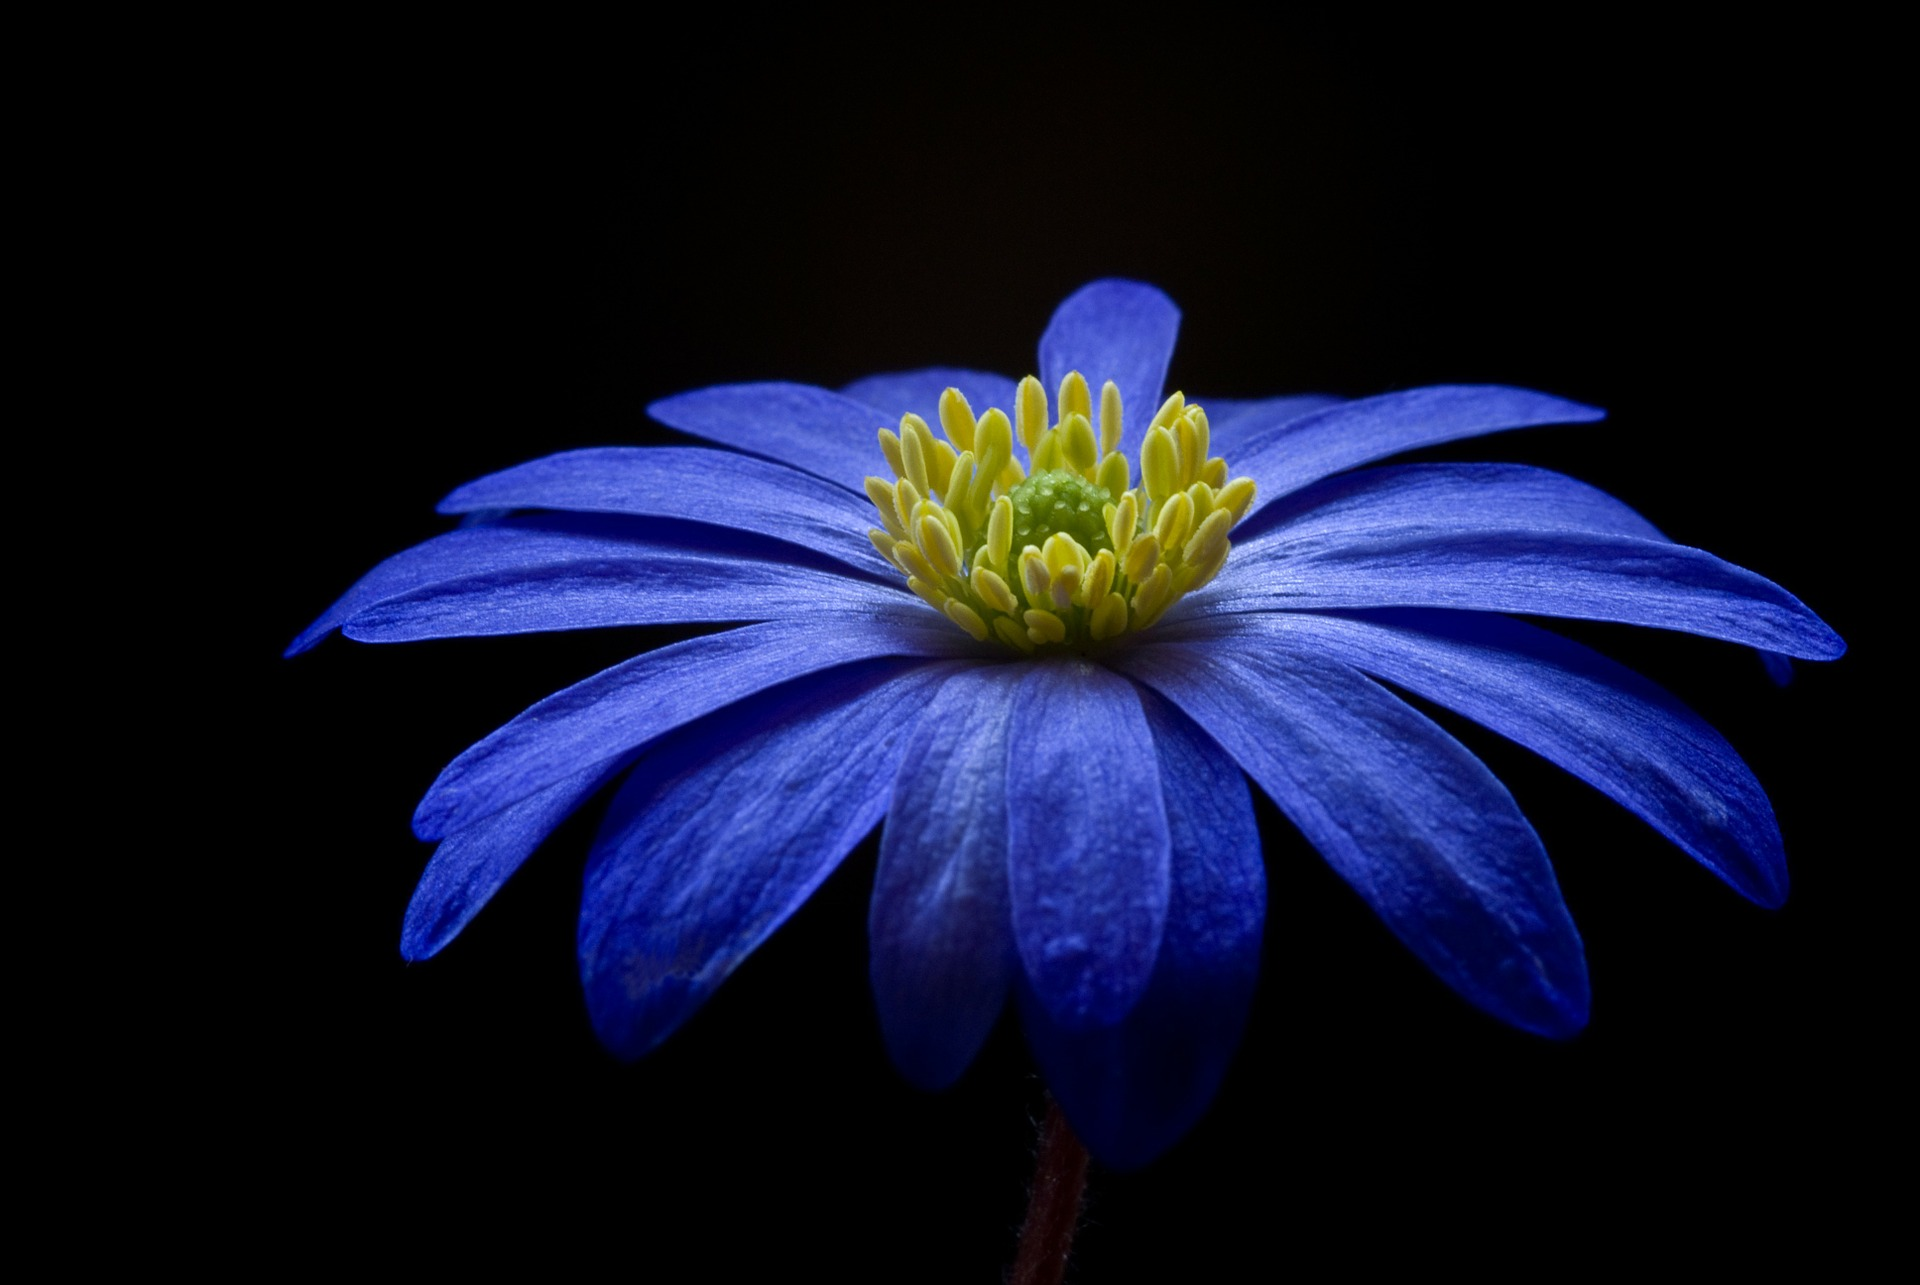 anemone-56414_1920.jpg